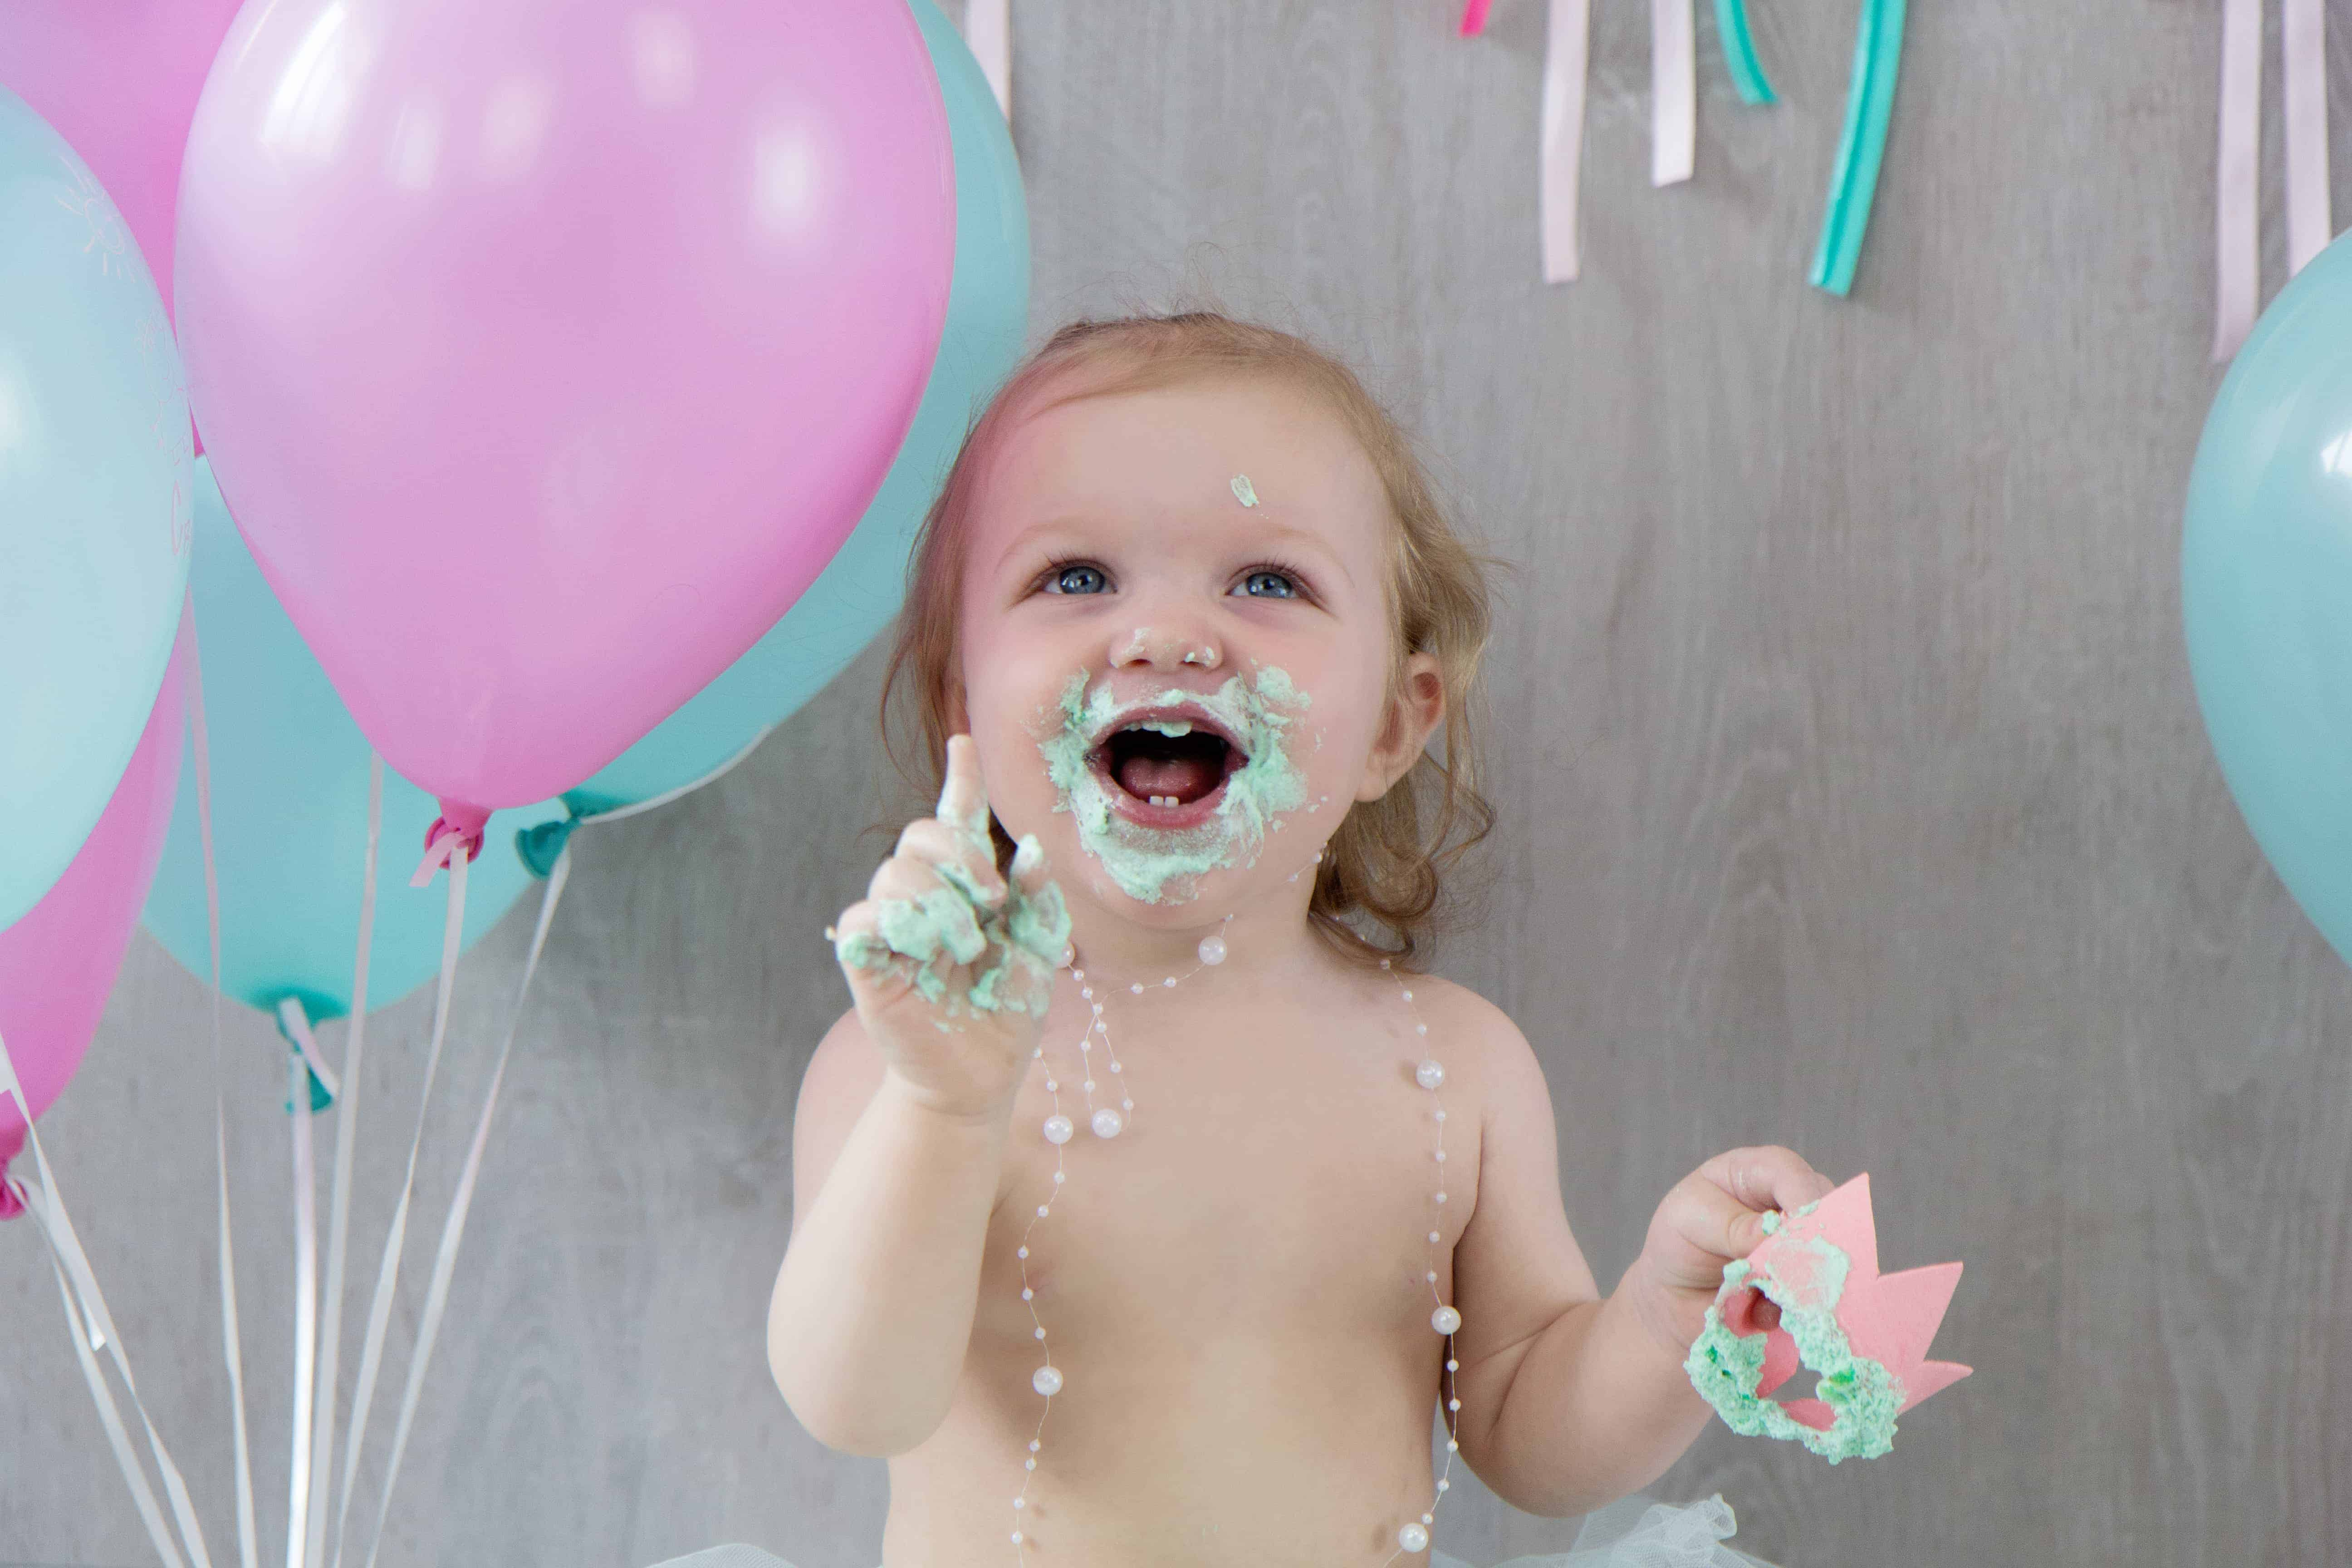 Terrific 20 Healthy Smash Cake Recipes For Your Babys 1St Birthday Funny Birthday Cards Online Alyptdamsfinfo